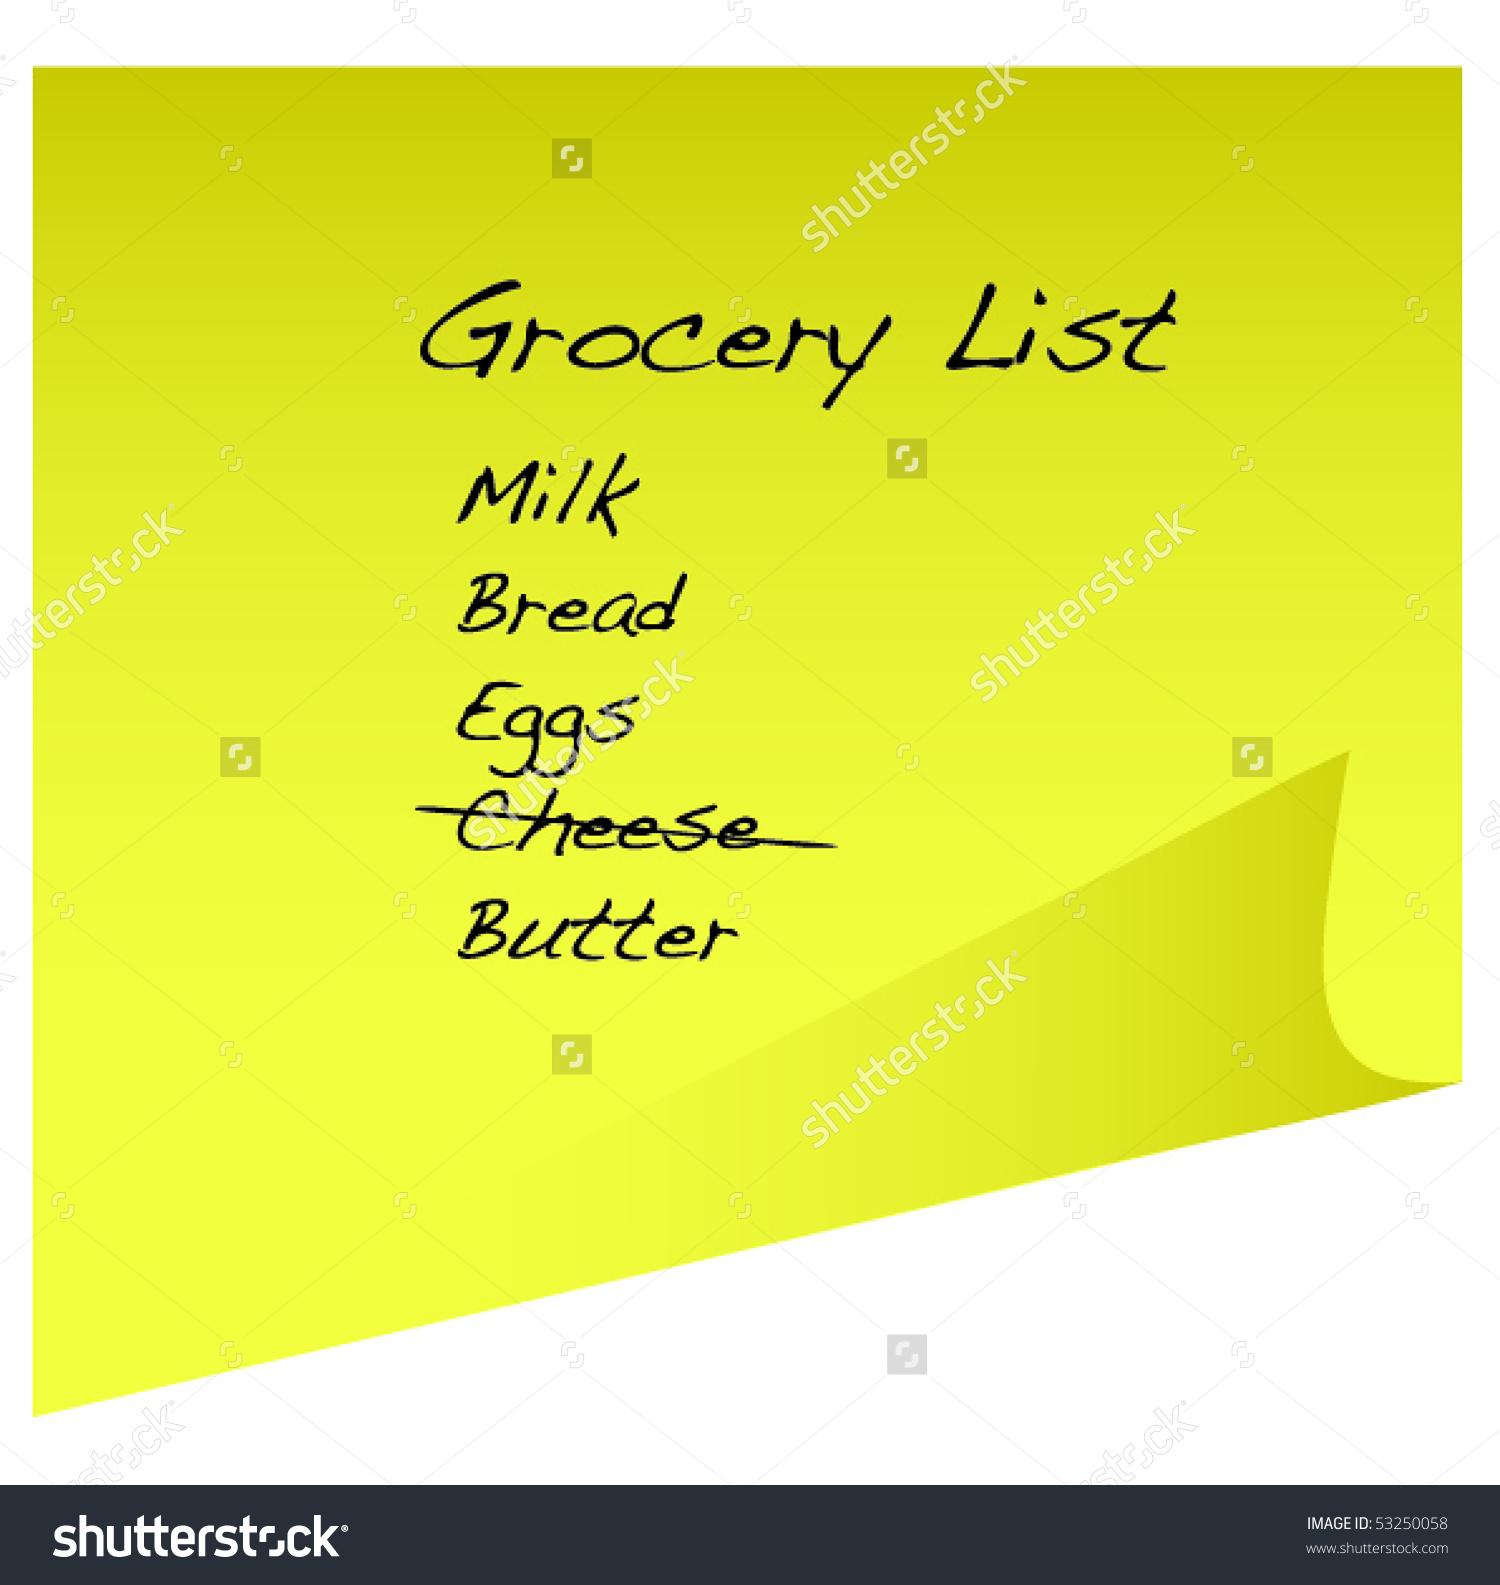 Clipart grocery list jpg Grocery list clipart - ClipartFox jpg